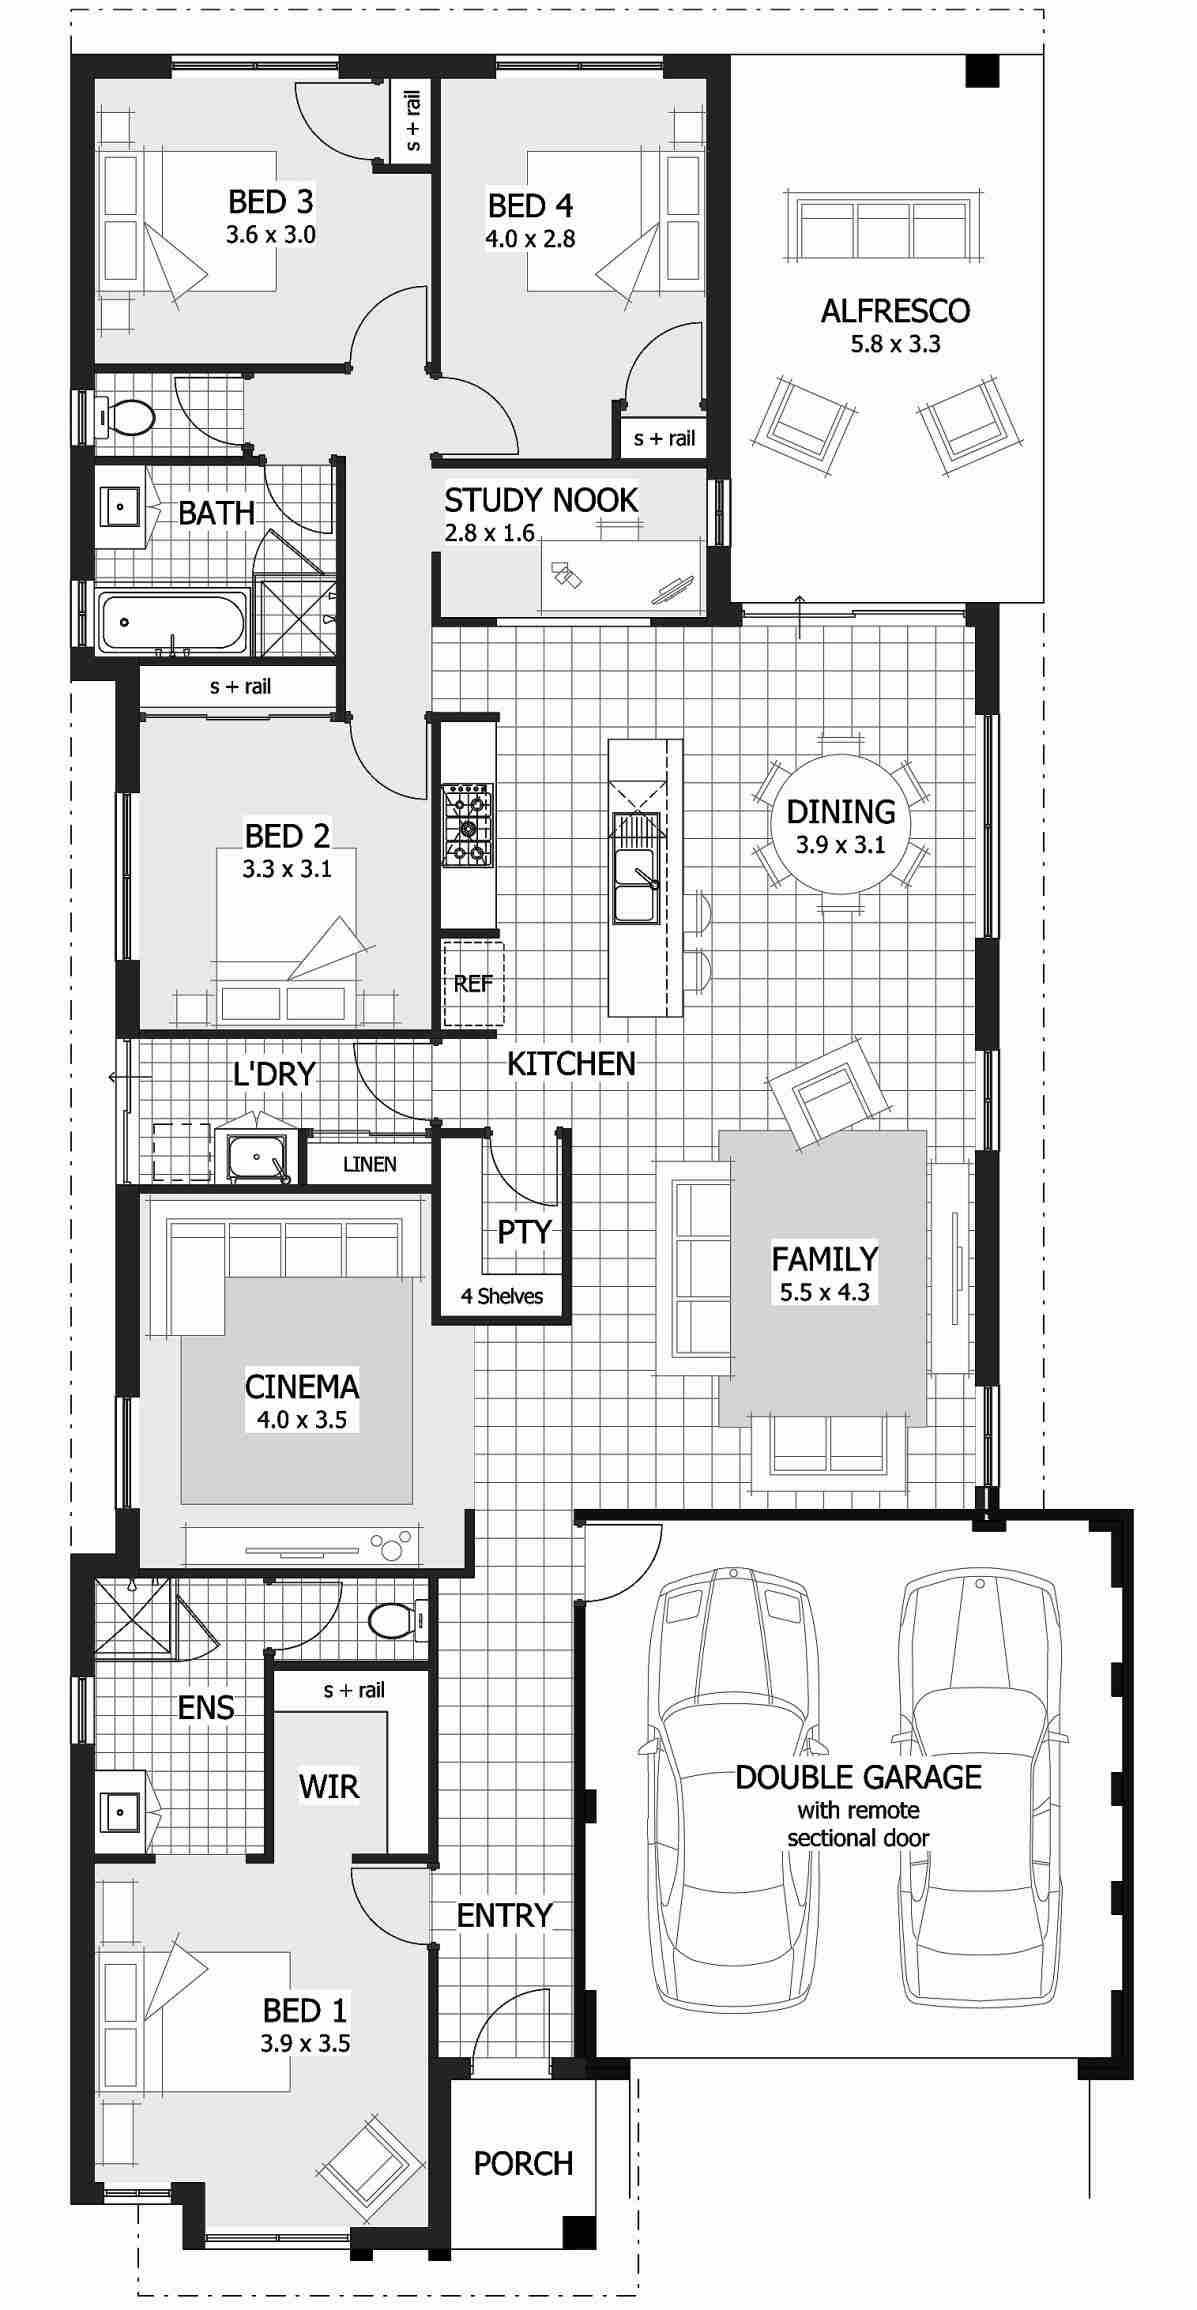 Single storey house plans narrow home design floor also kayla rosalia kaylarosalia on pinterest rh